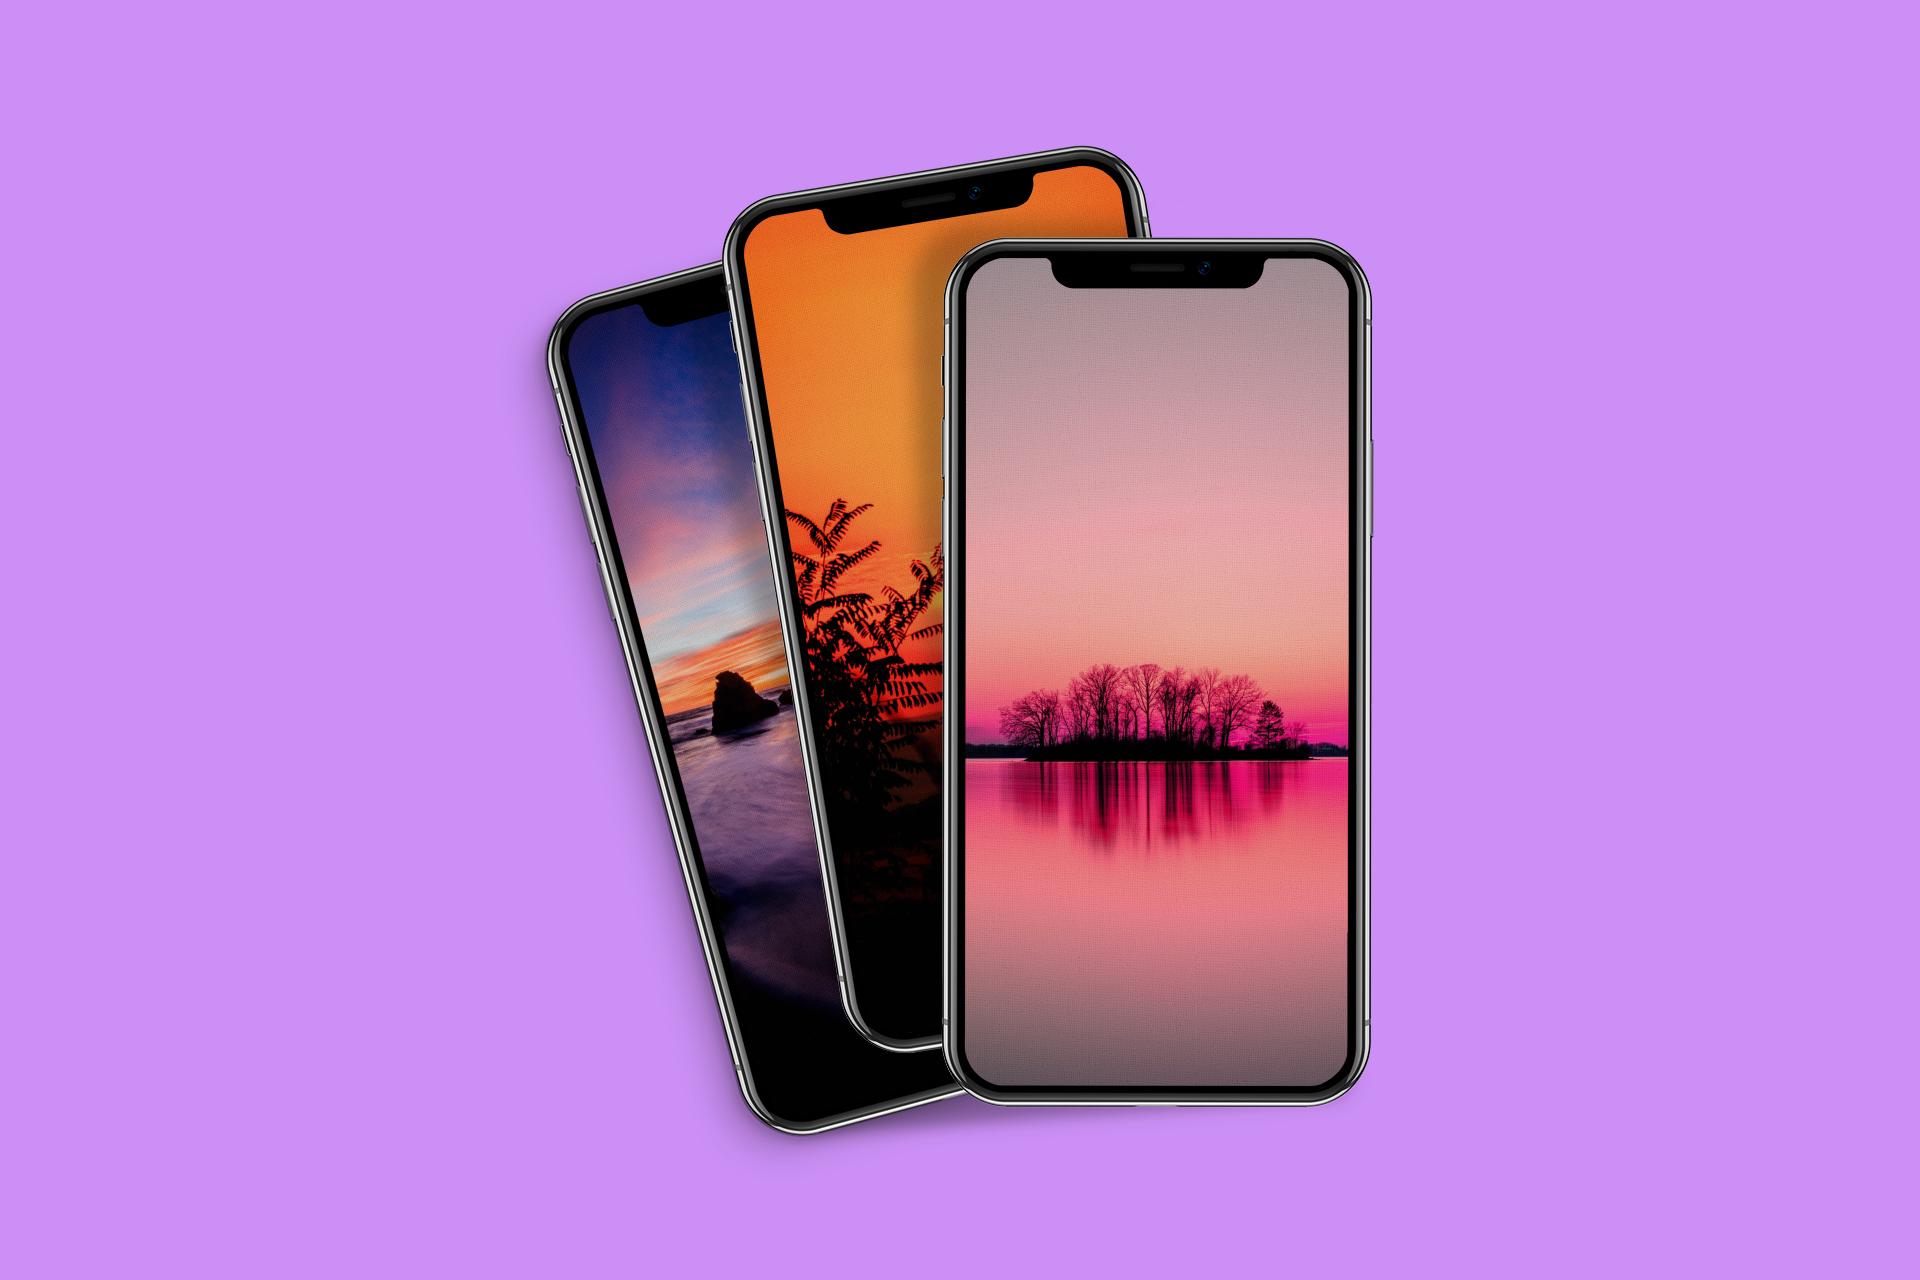 canvas vector iphone wallpaper jianoliu idownloadblog mock up